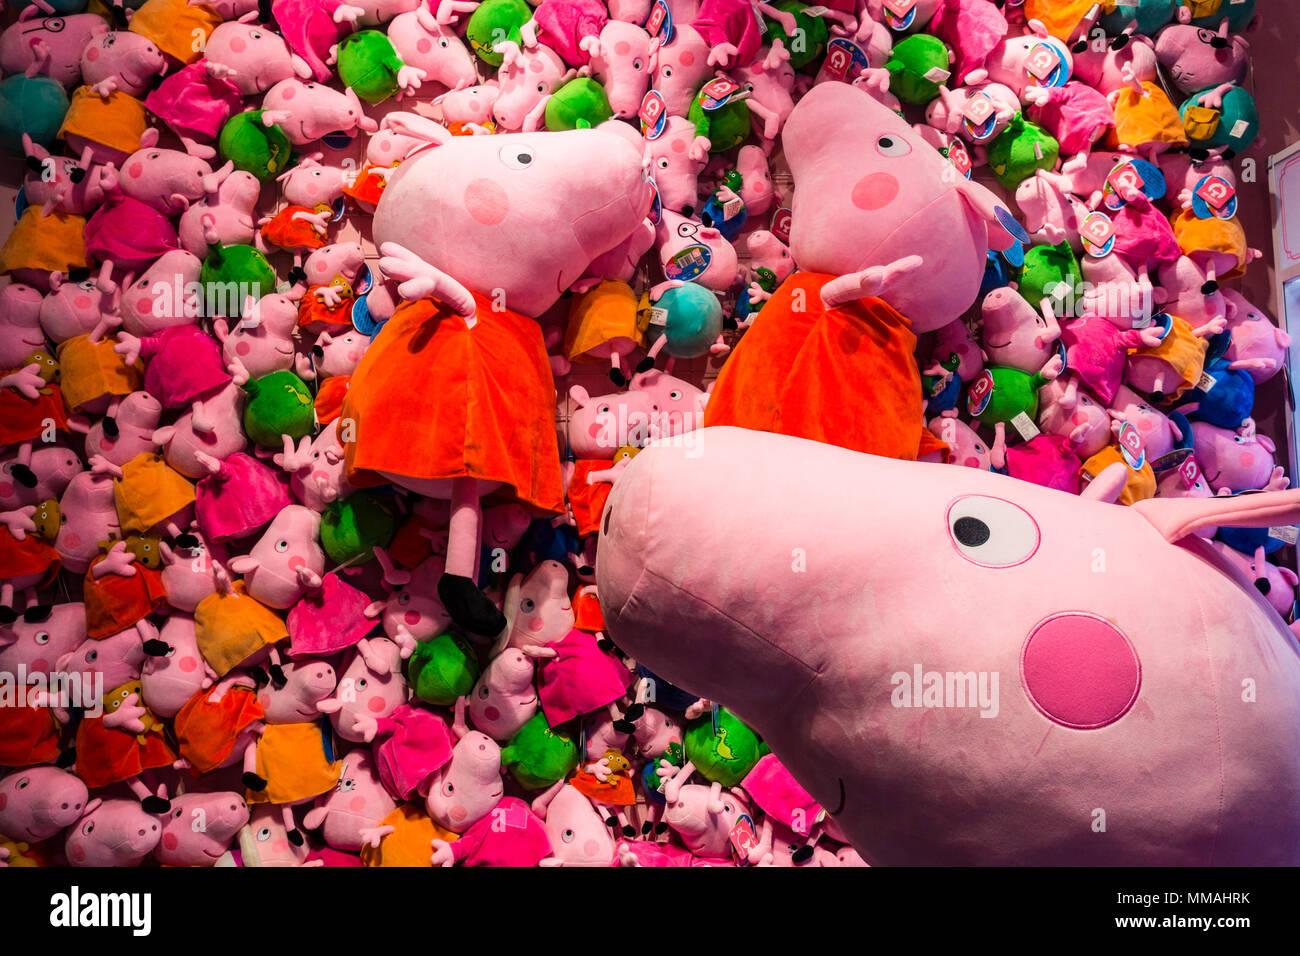 Stuffed Toys Peppa Pig Stock Photos Stuffed Toys Peppa Pig Stock